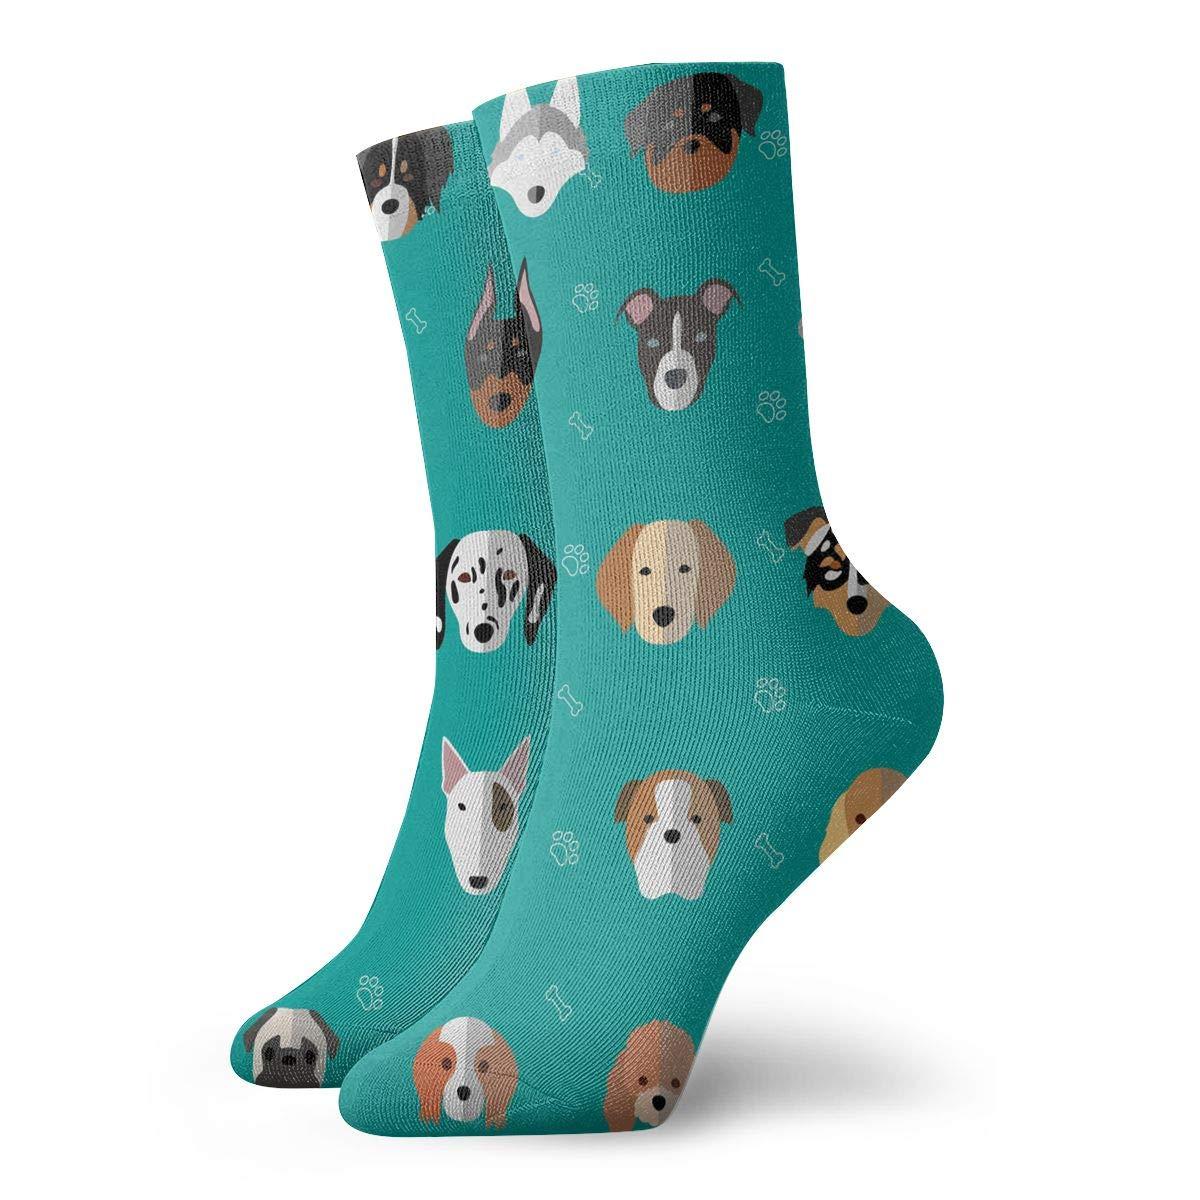 Dog Heads Cute Unisex Funny Casual Crew Socks Athletic Socks For Boys Girls Kids Teenagers